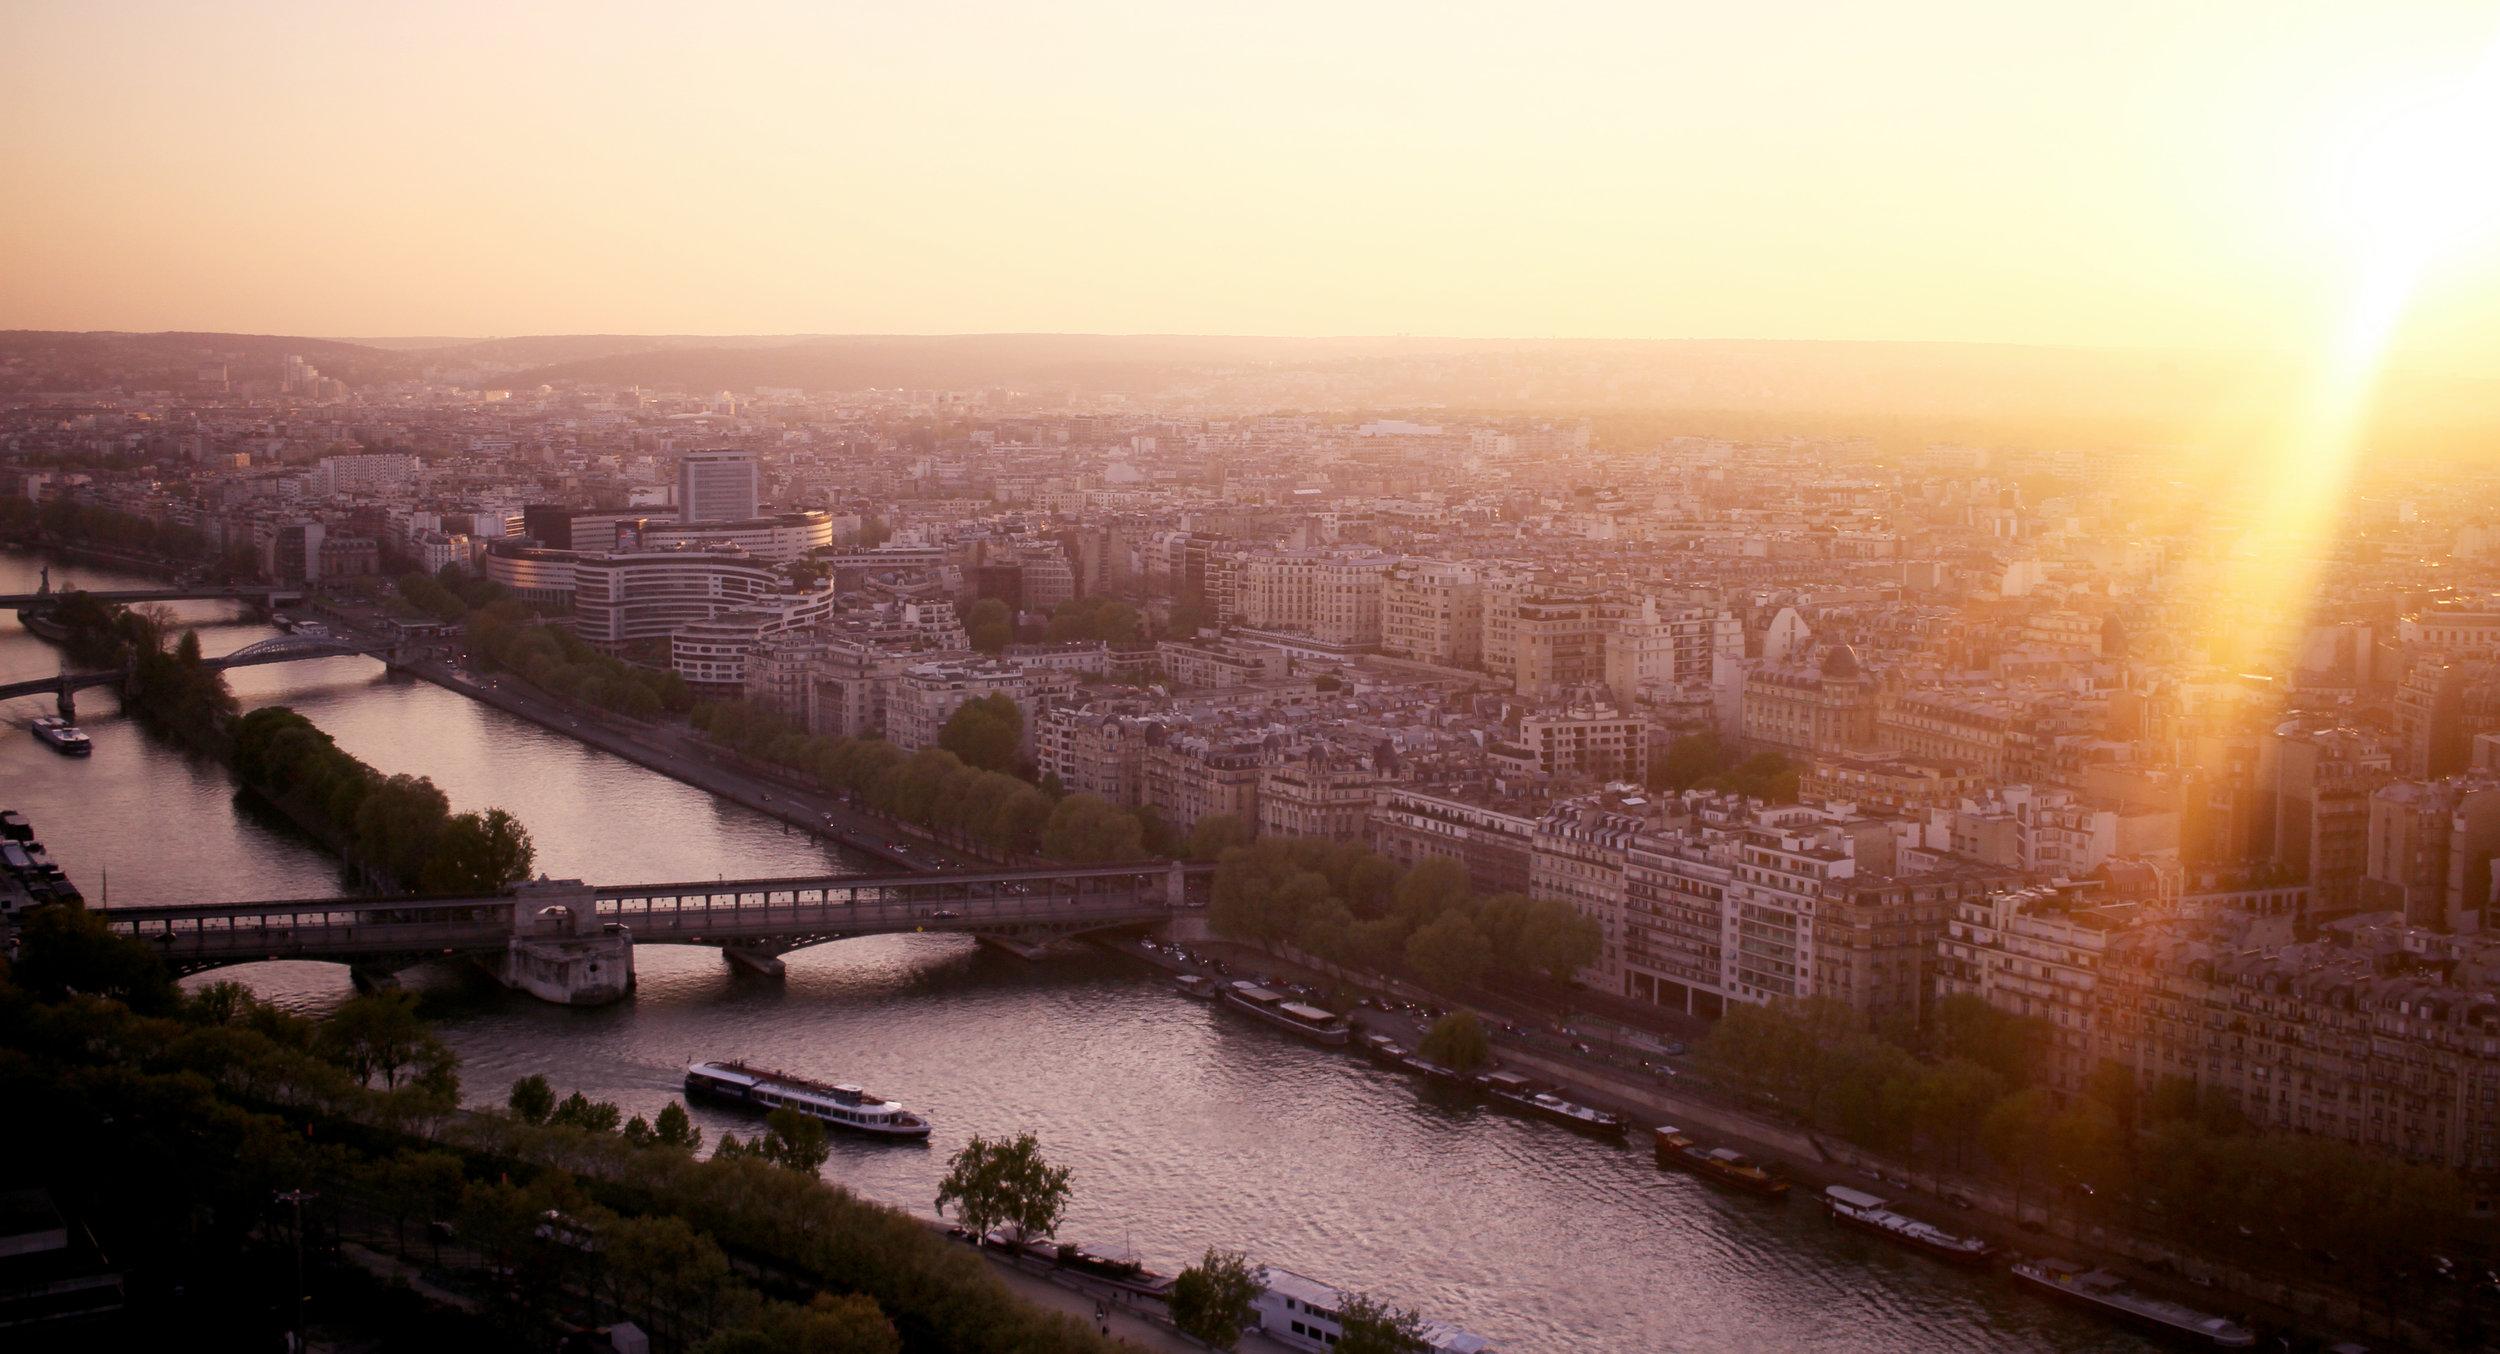 The Paris.jpg